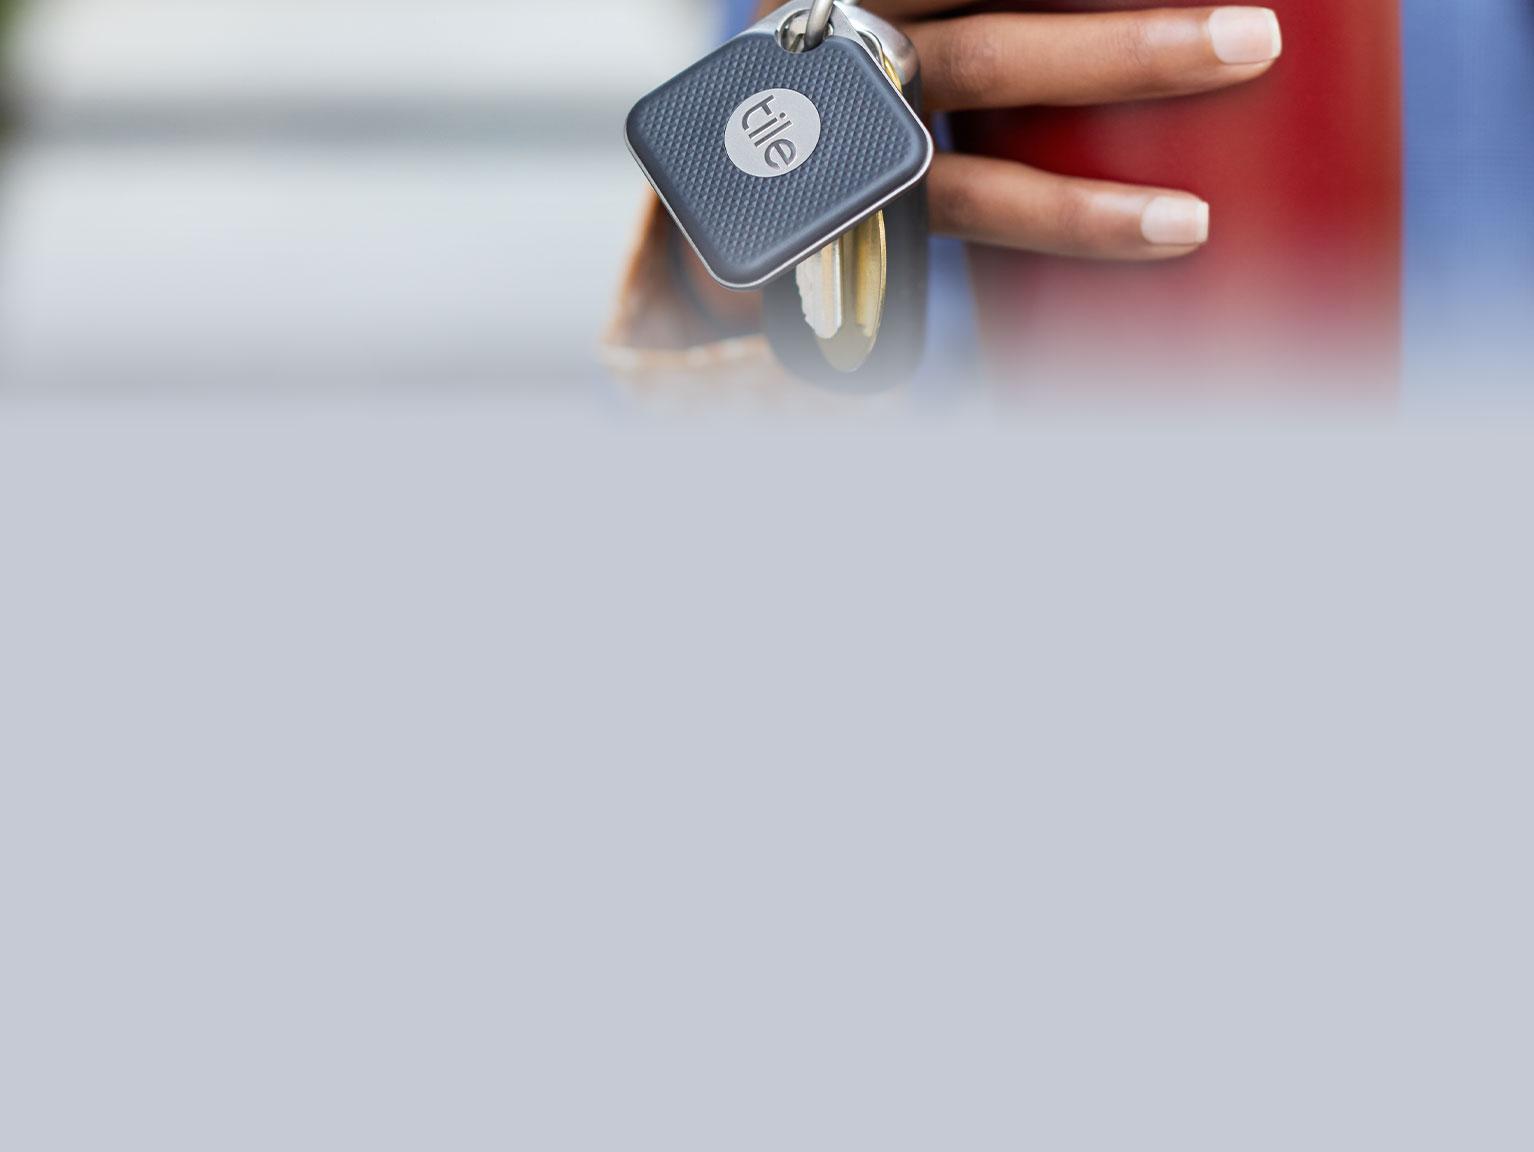 tile trackers for keys wallets